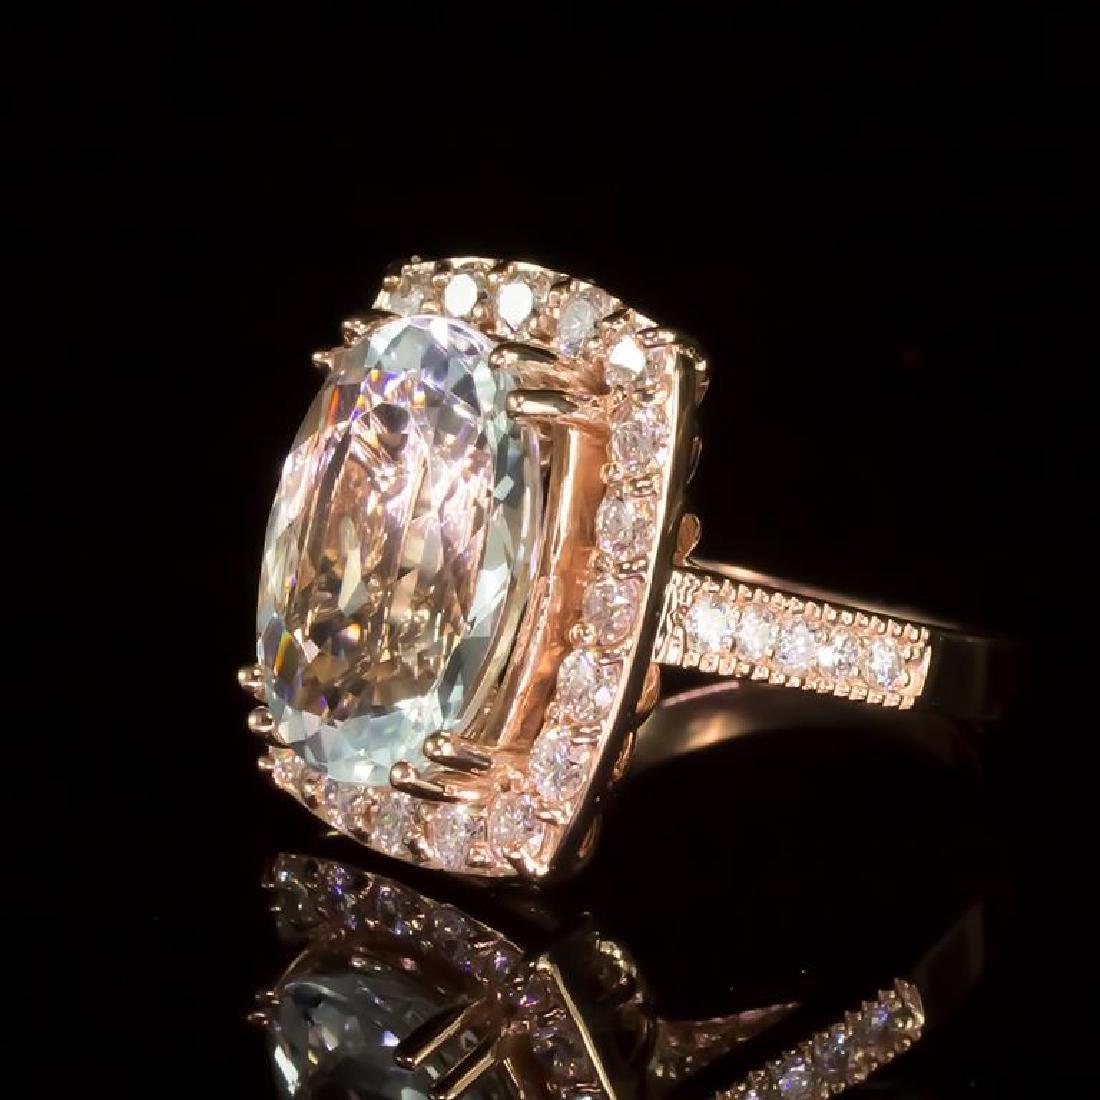 14K Gold 6.50ct Aquamarine 1.41ct Diamond Ring - 2